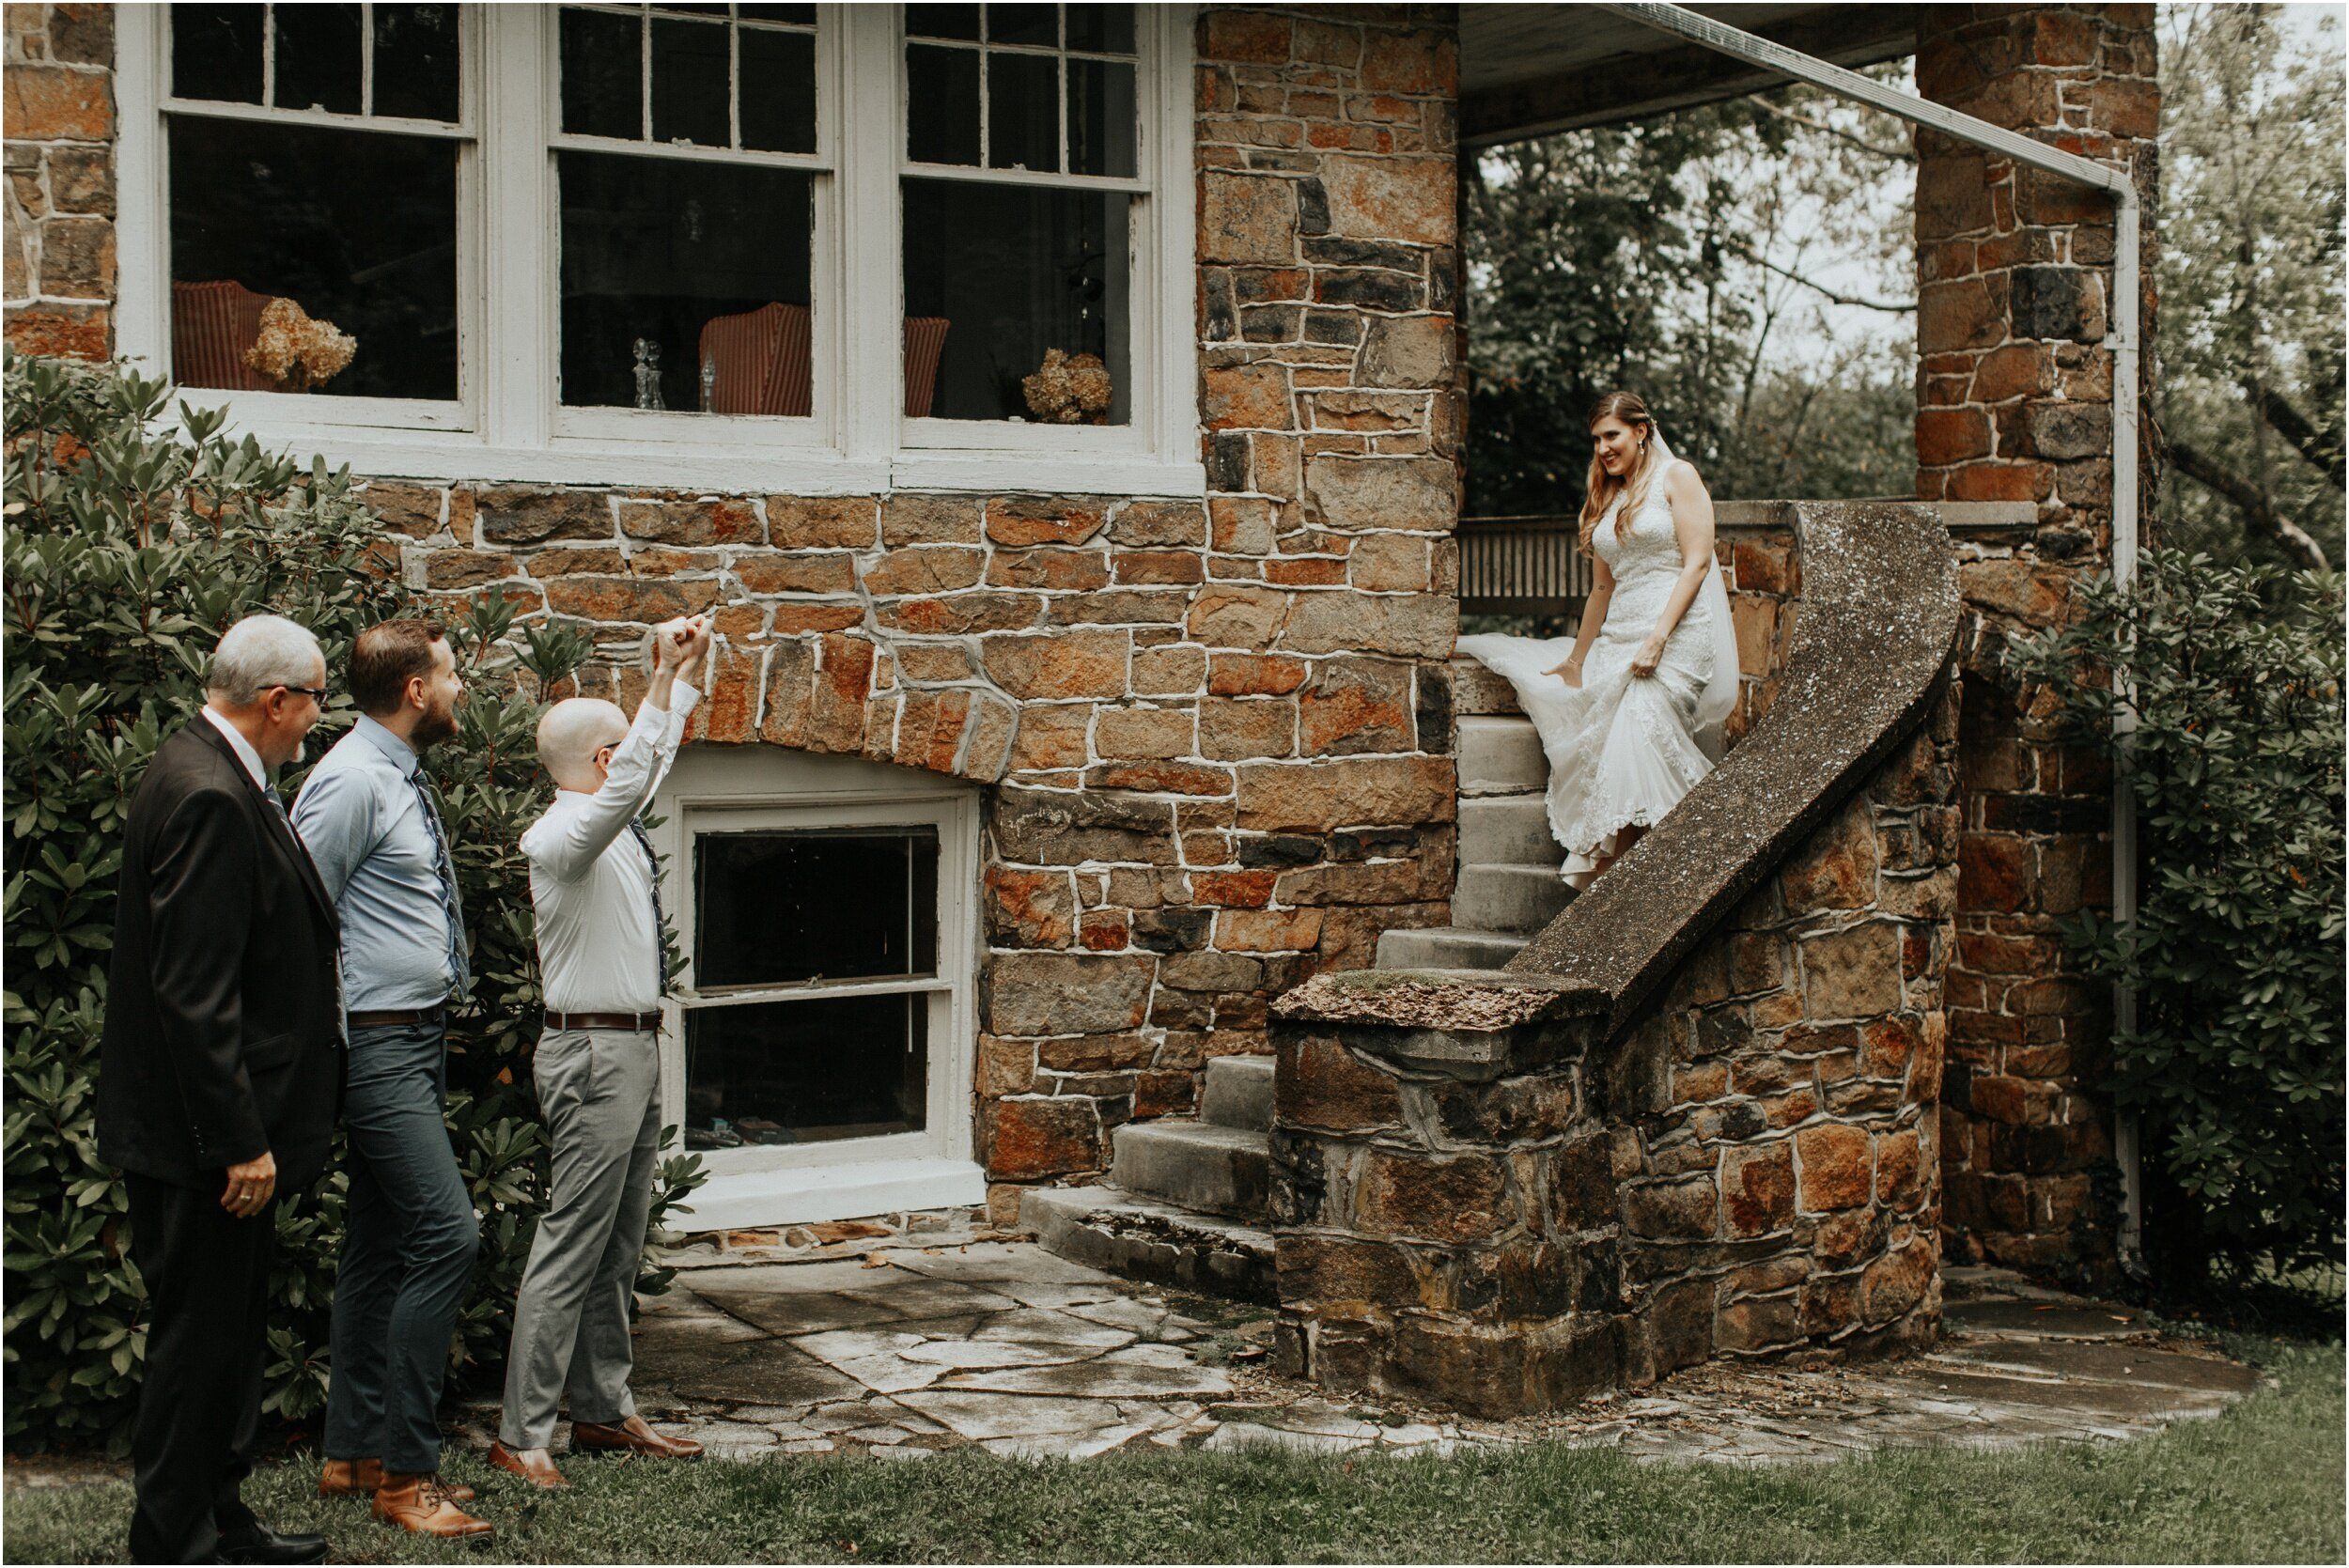 steph-and-jordan-cox-our-wedding-historic-shady-lane-compass-wedding-collective-hazel-lining-photography-destination-elopement-wedding-engagement-photography_0019.jpg